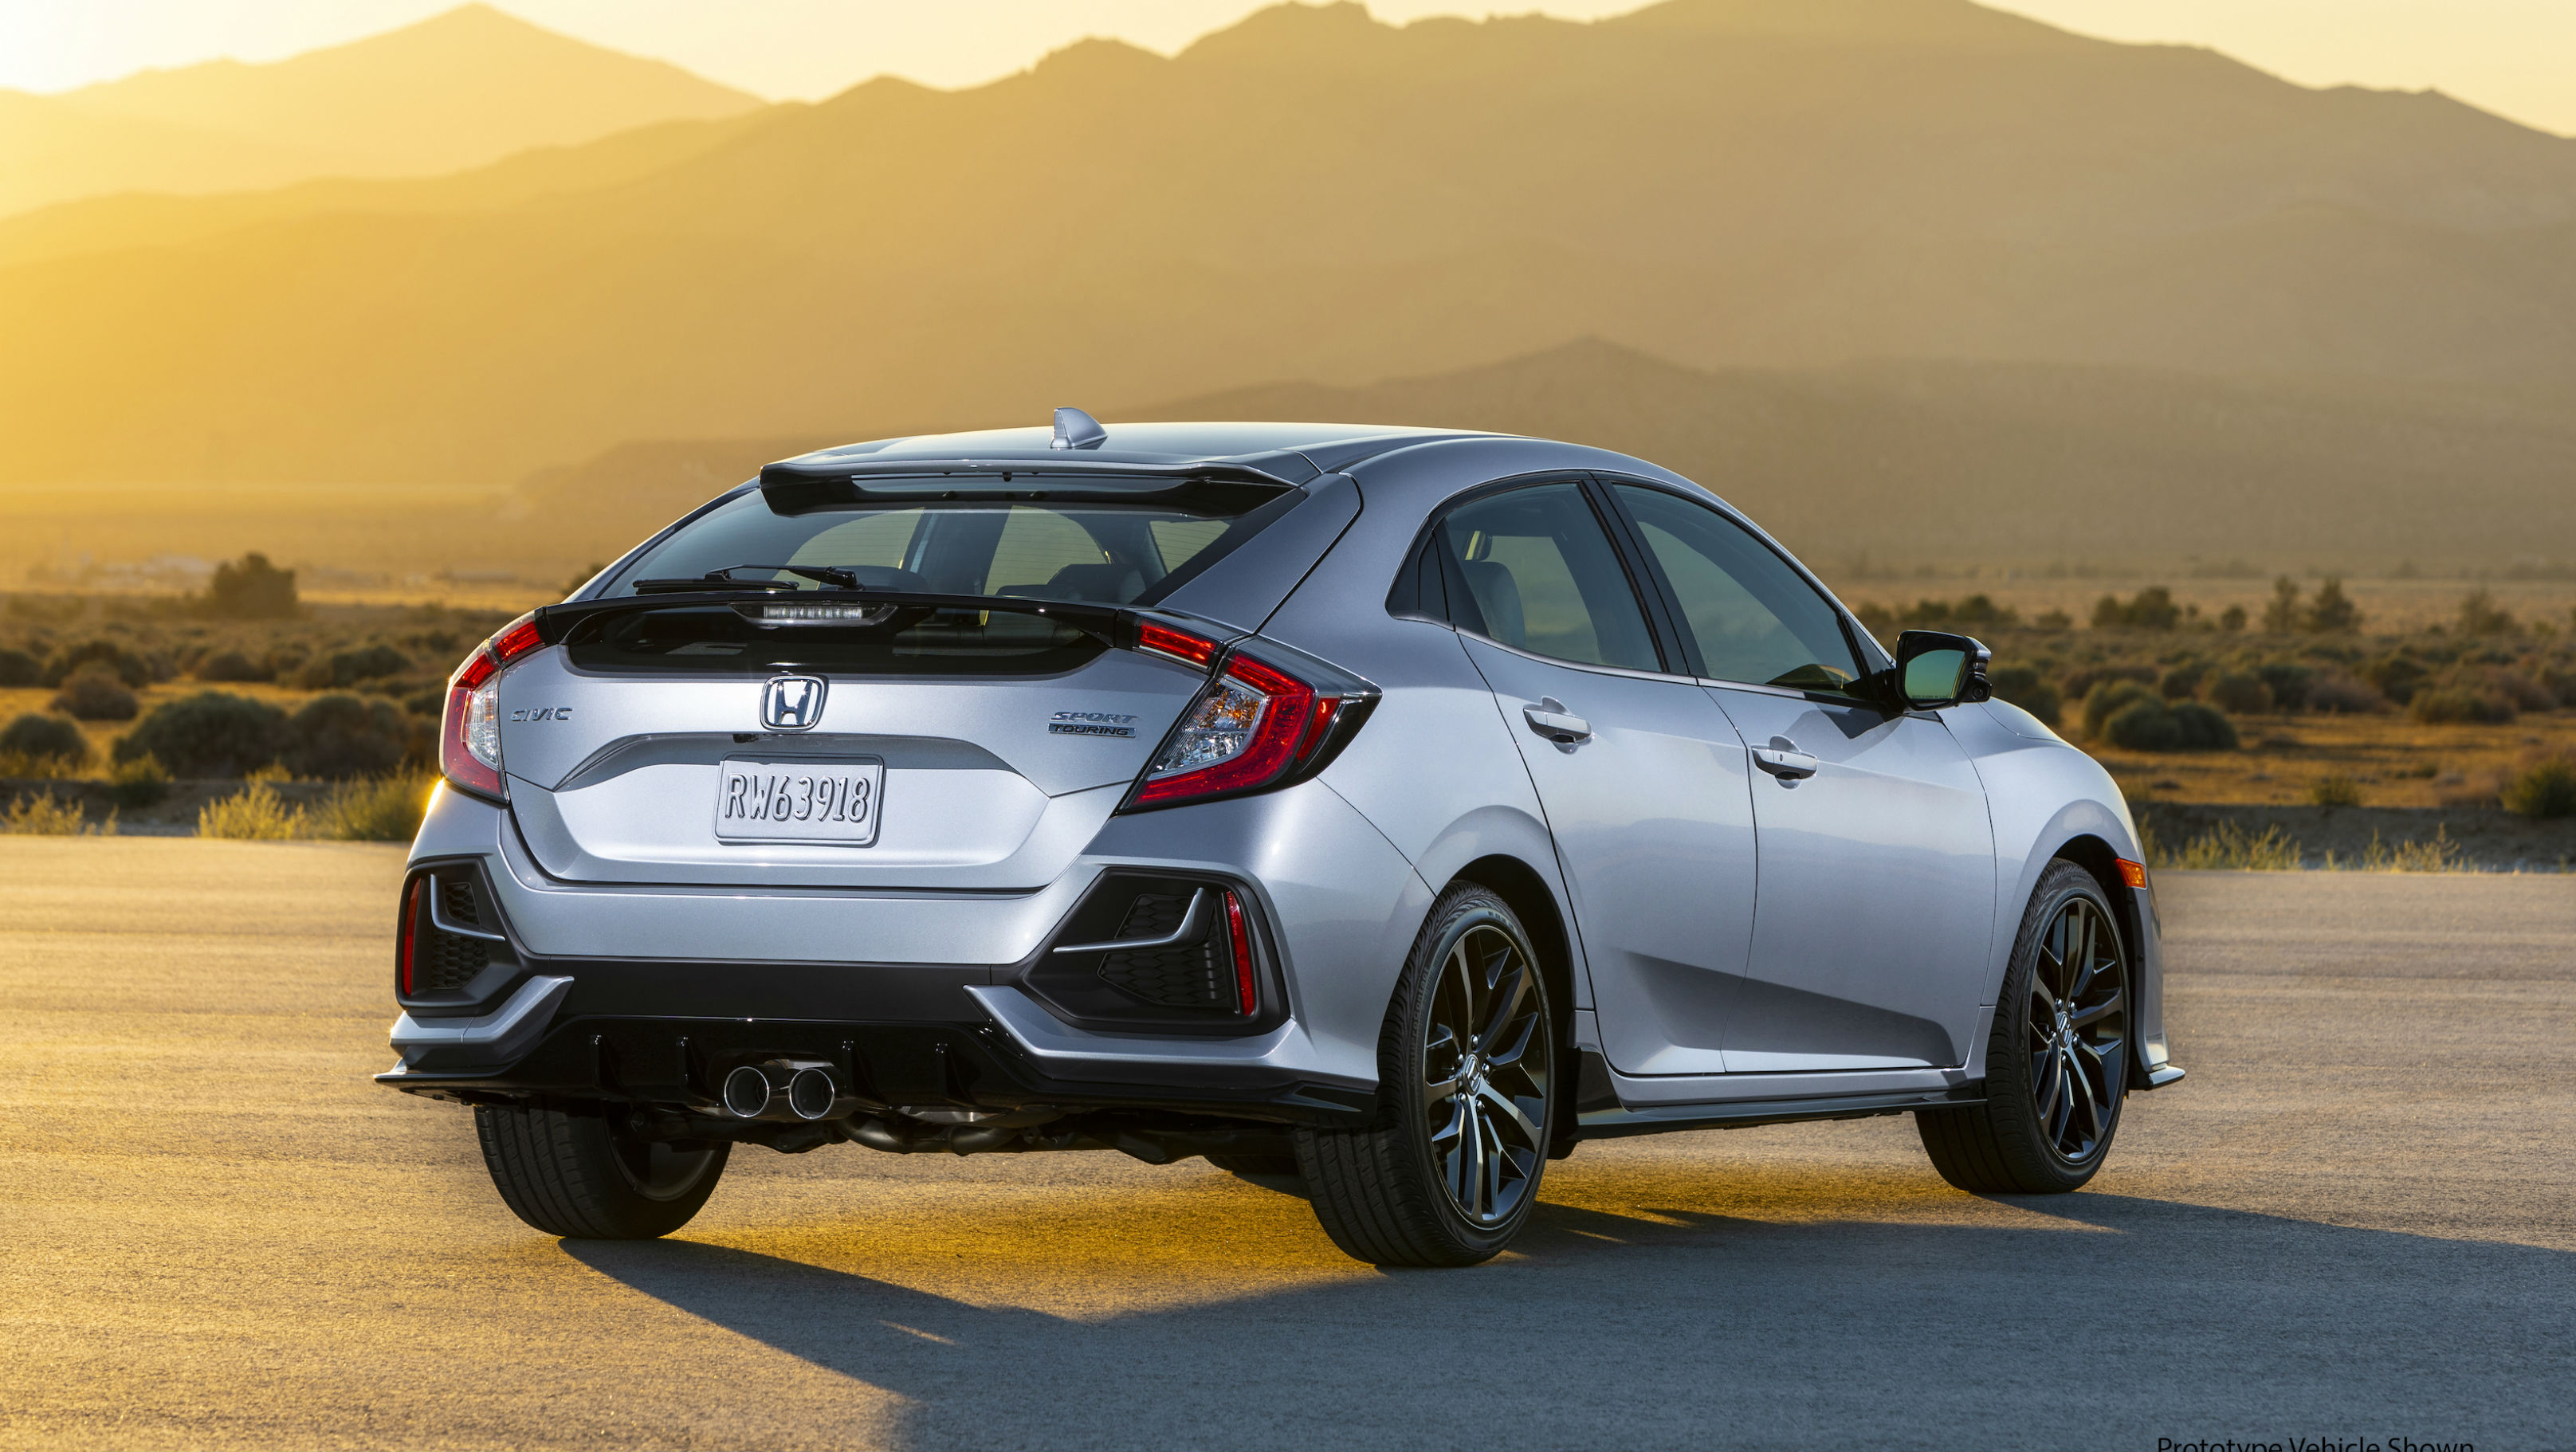 honda civic hatchback refreshed for 2020 - wheels.ca